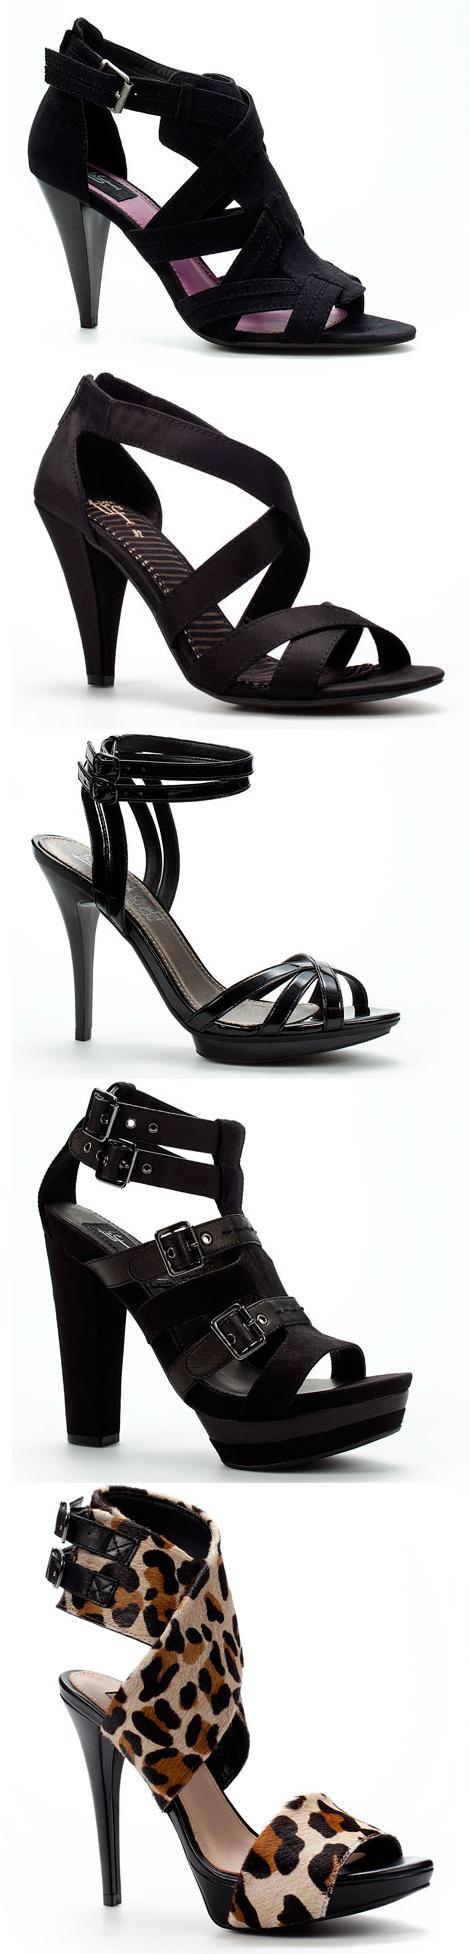 Sandalias de fiesta, de Zara 2010